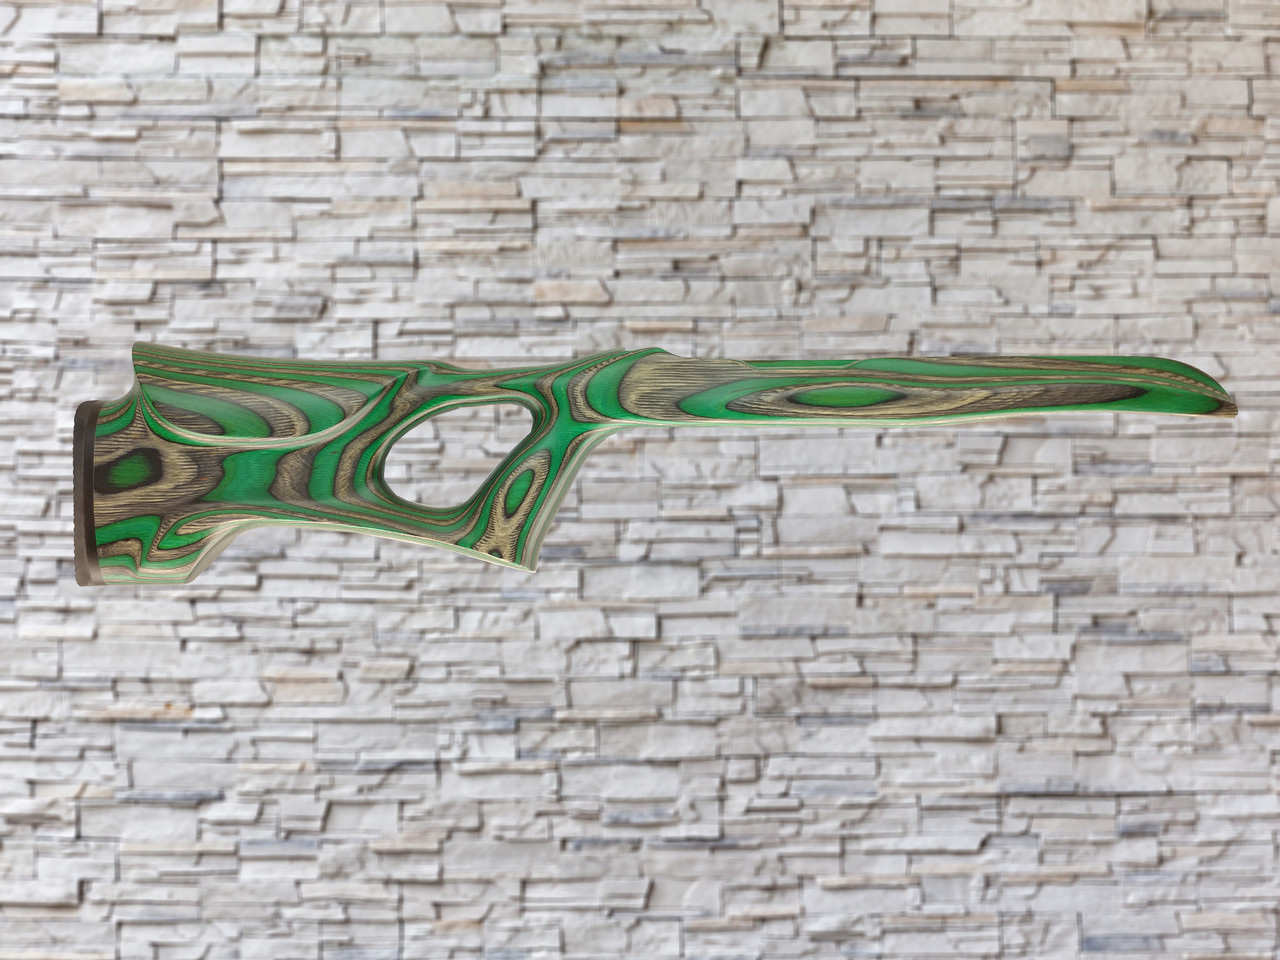 Revolution Talon Evergreen Bull Barrel Wood stock for Ruger 10/22, T/CR22